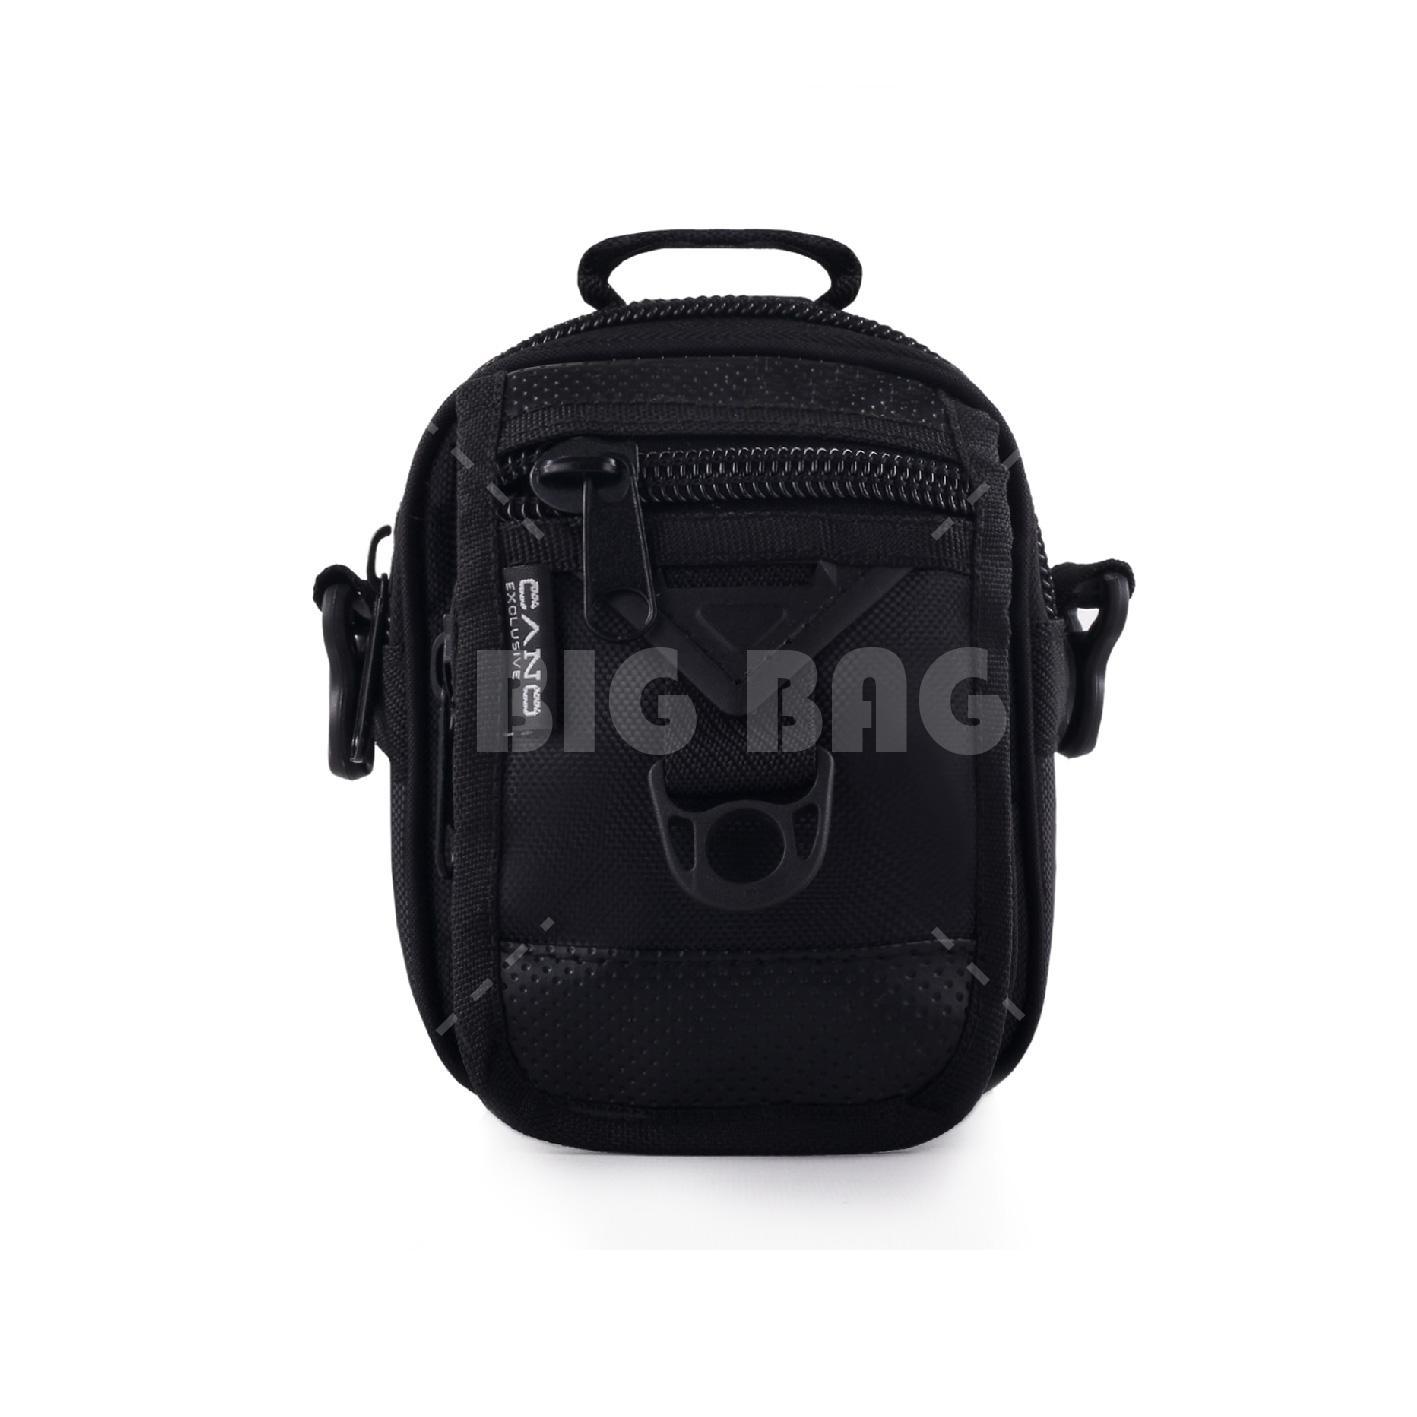 Gear Bag Scorpion X87 Backpack Black Red Raincover Free Mini Cooper Source · Tas Selempang Cano Mini Rider Black Tas Pria Tas Messenger Tas Slempang ...